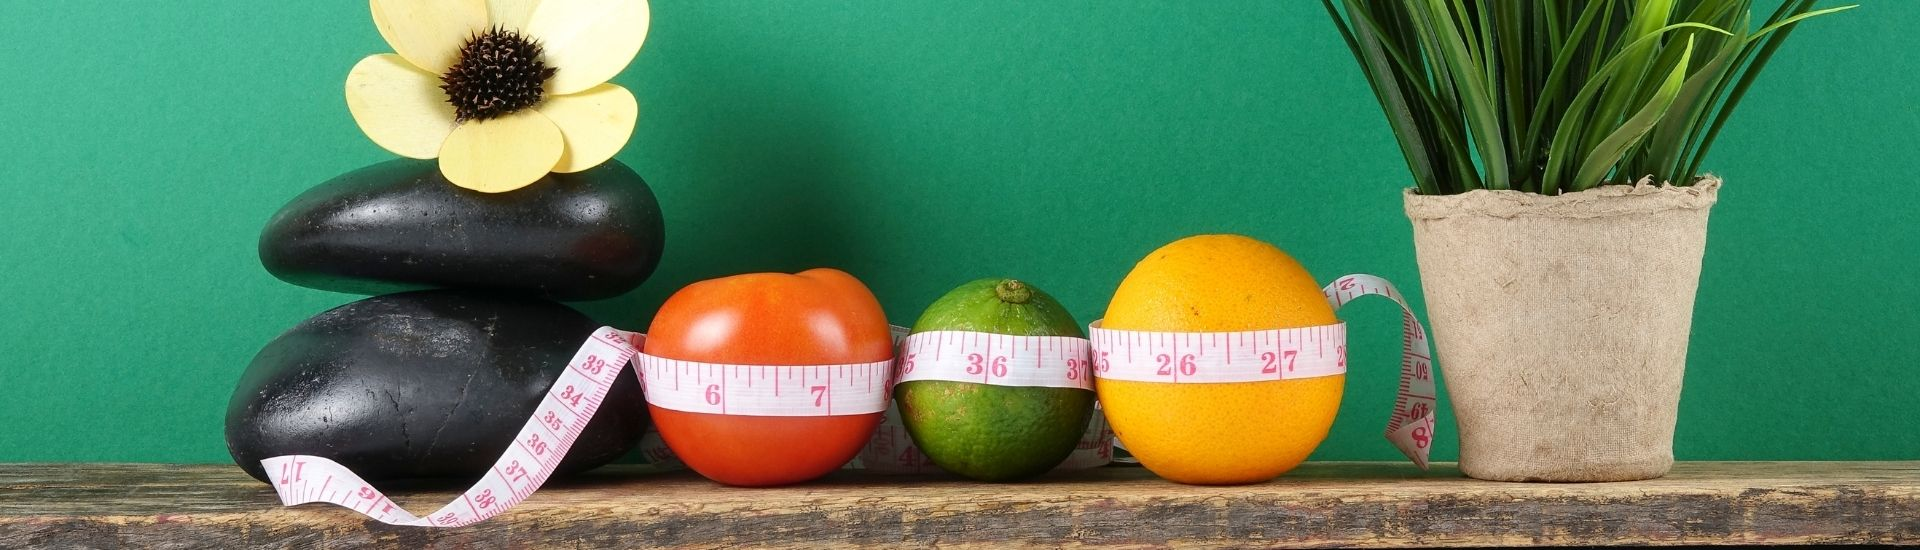 Weight Management banner image